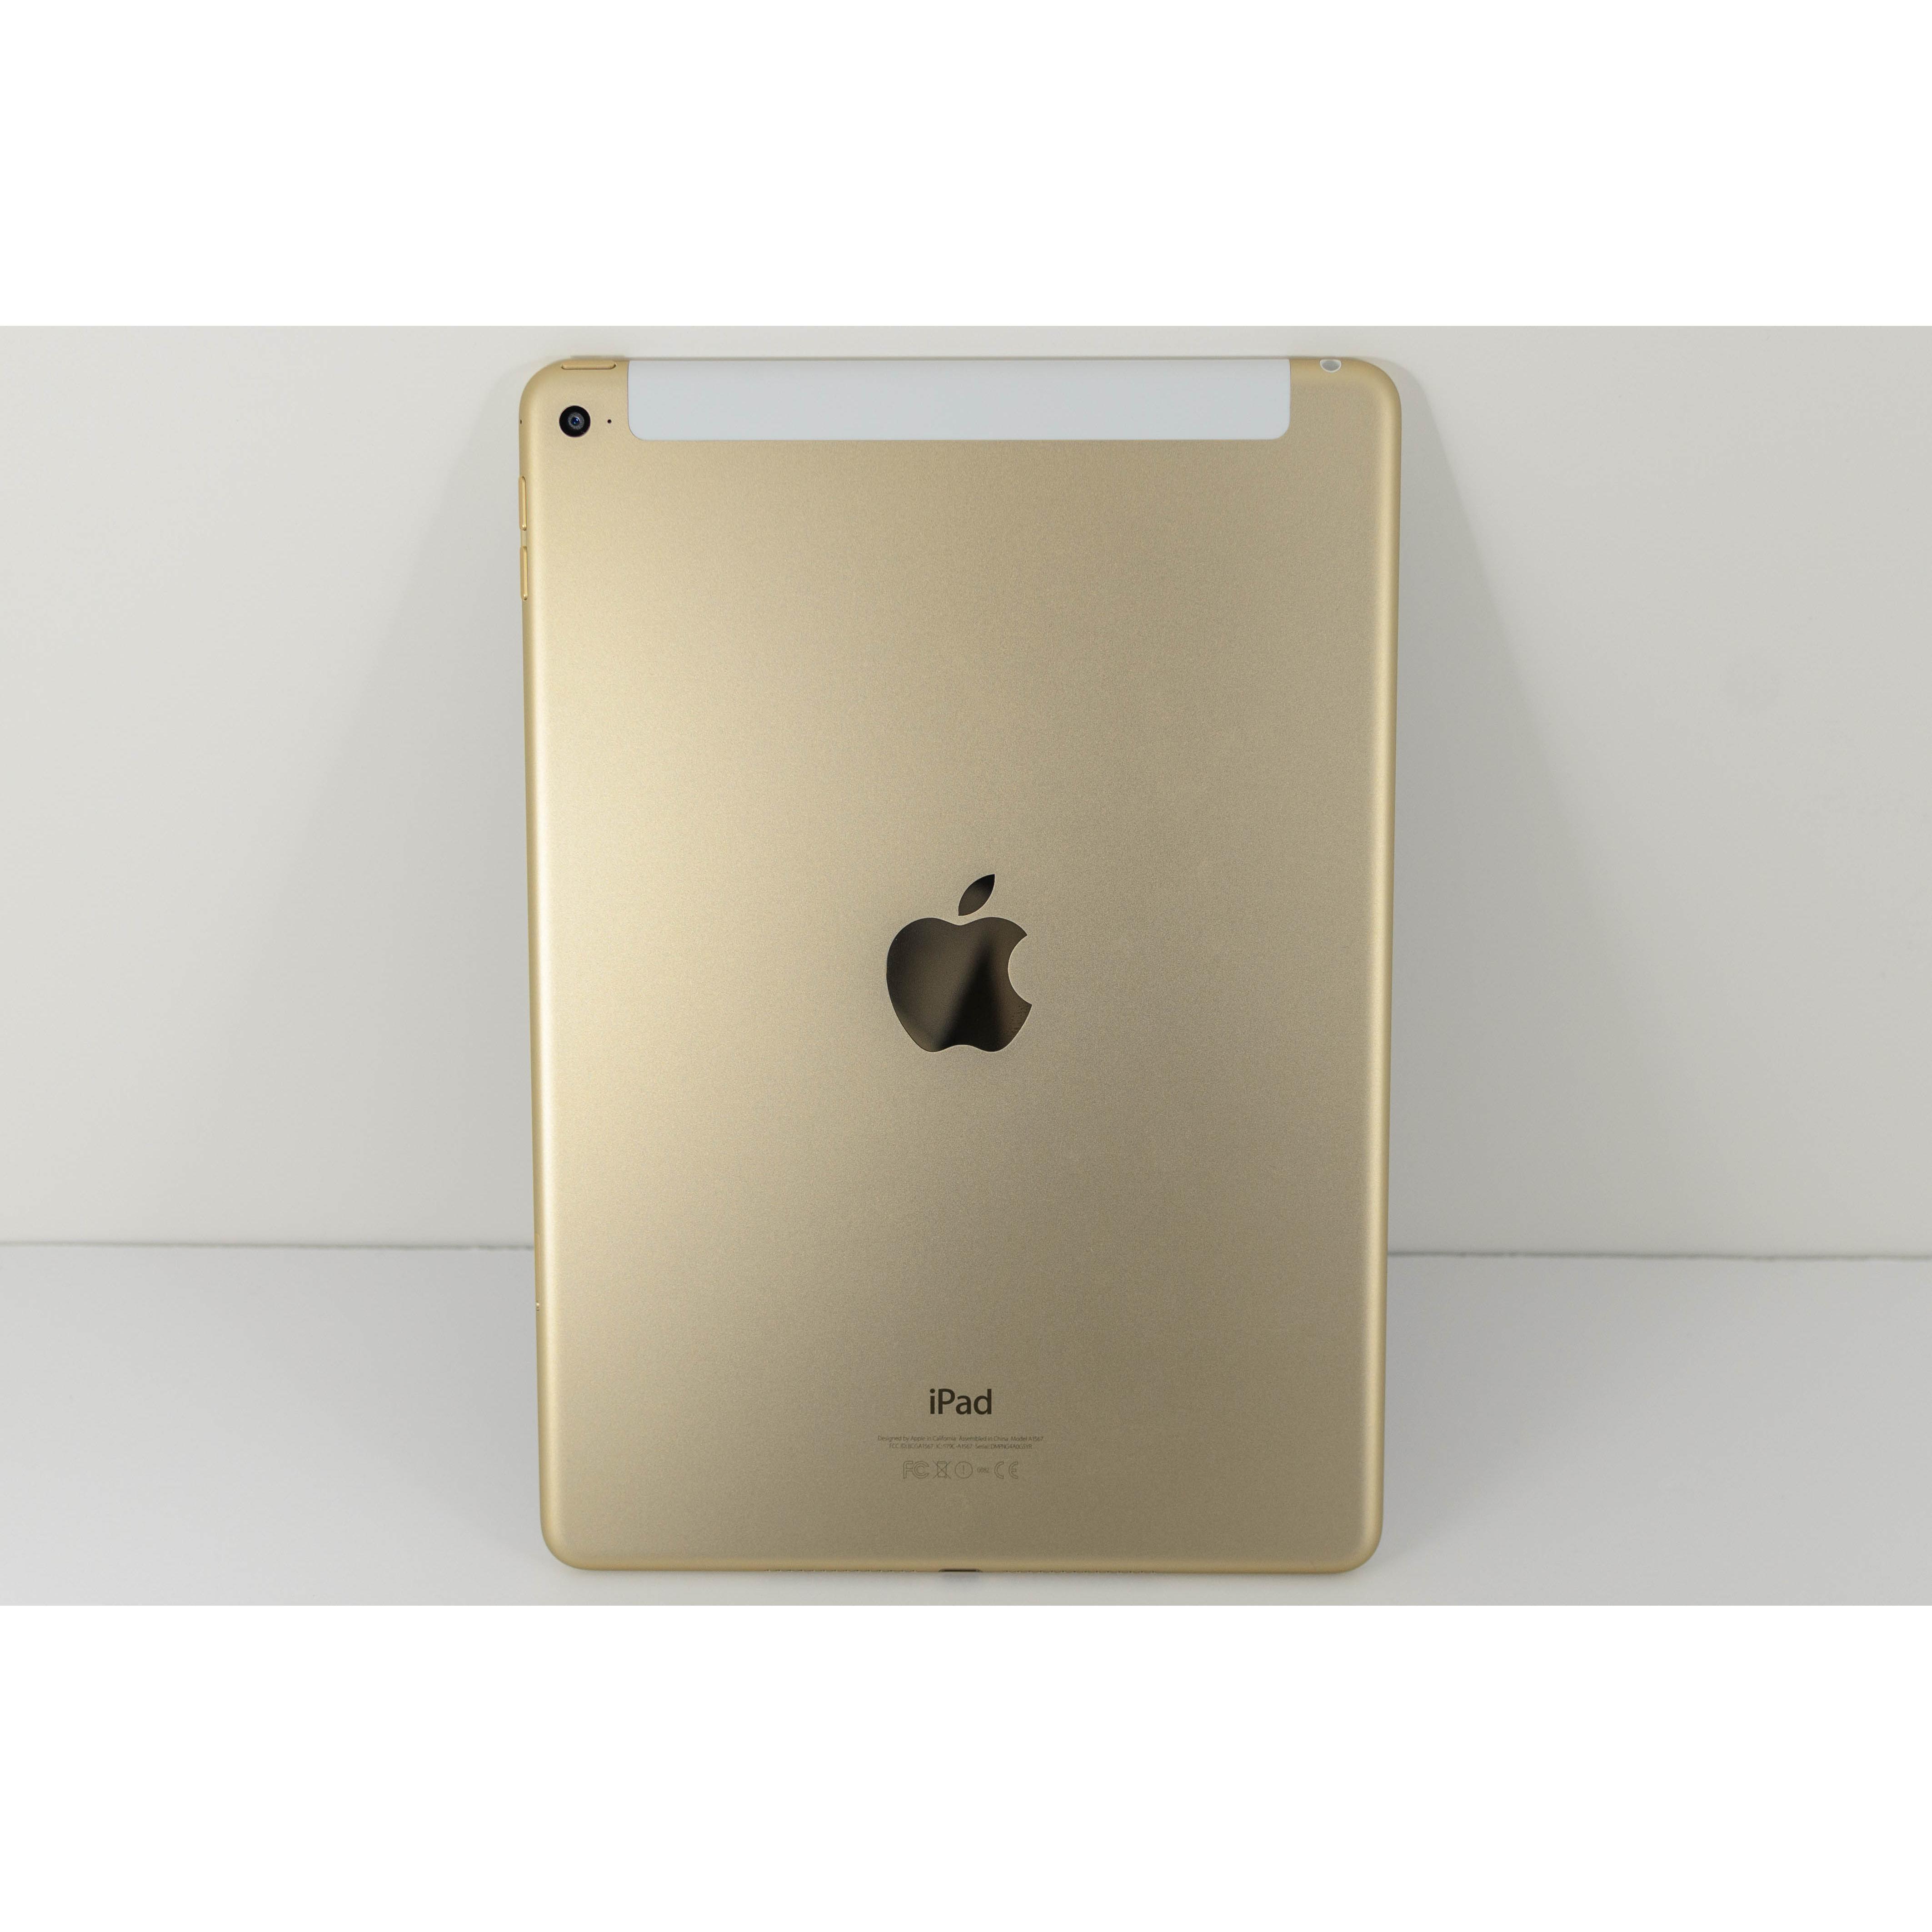 iPad Air 2 128GB LTE - Gold - Ohne Vertrag